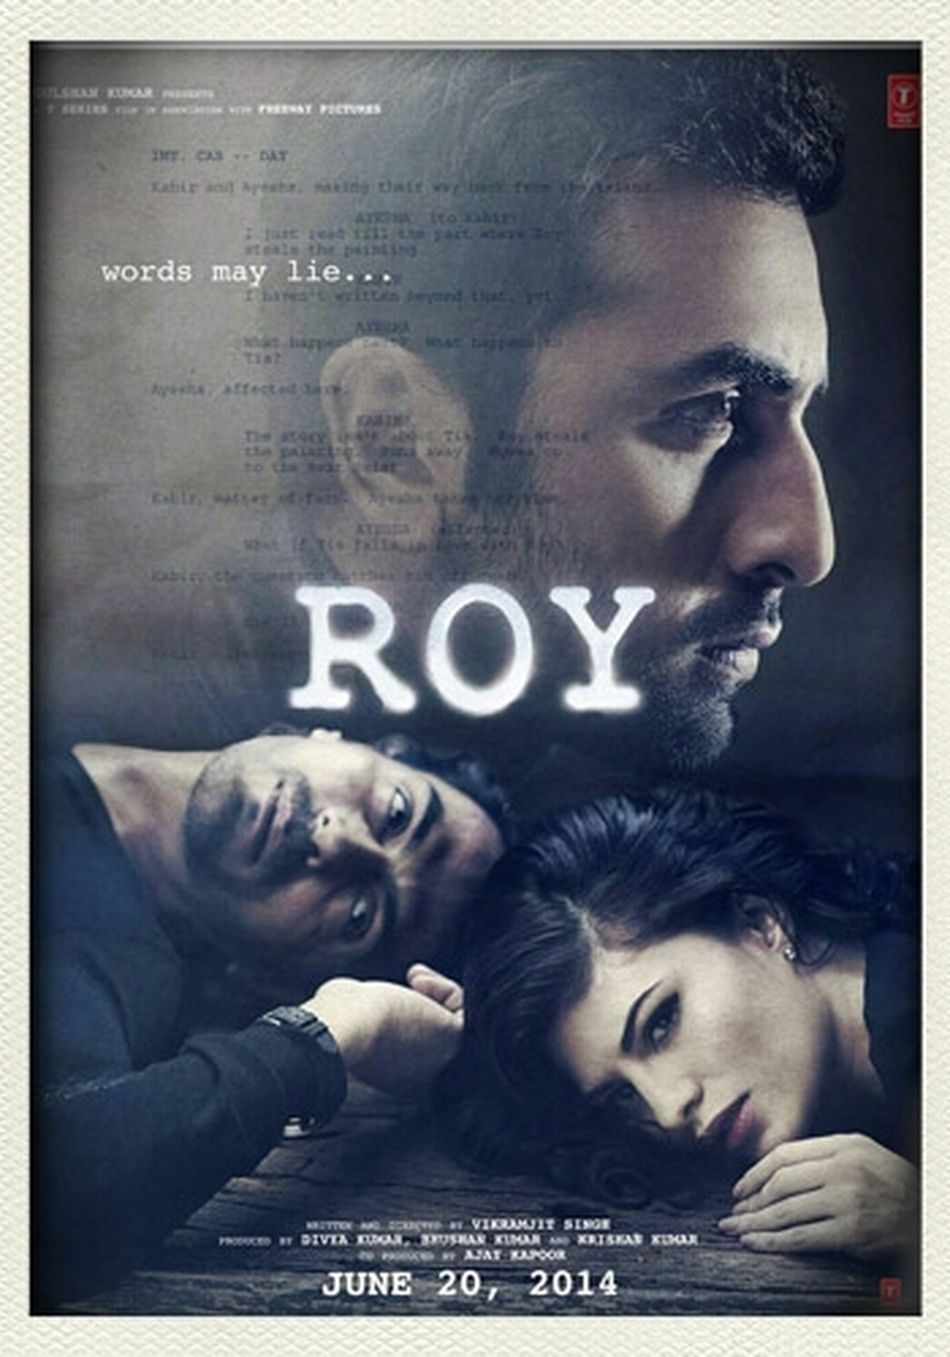 Ranbir Kapoor his upcoming film ROY. best of luck!